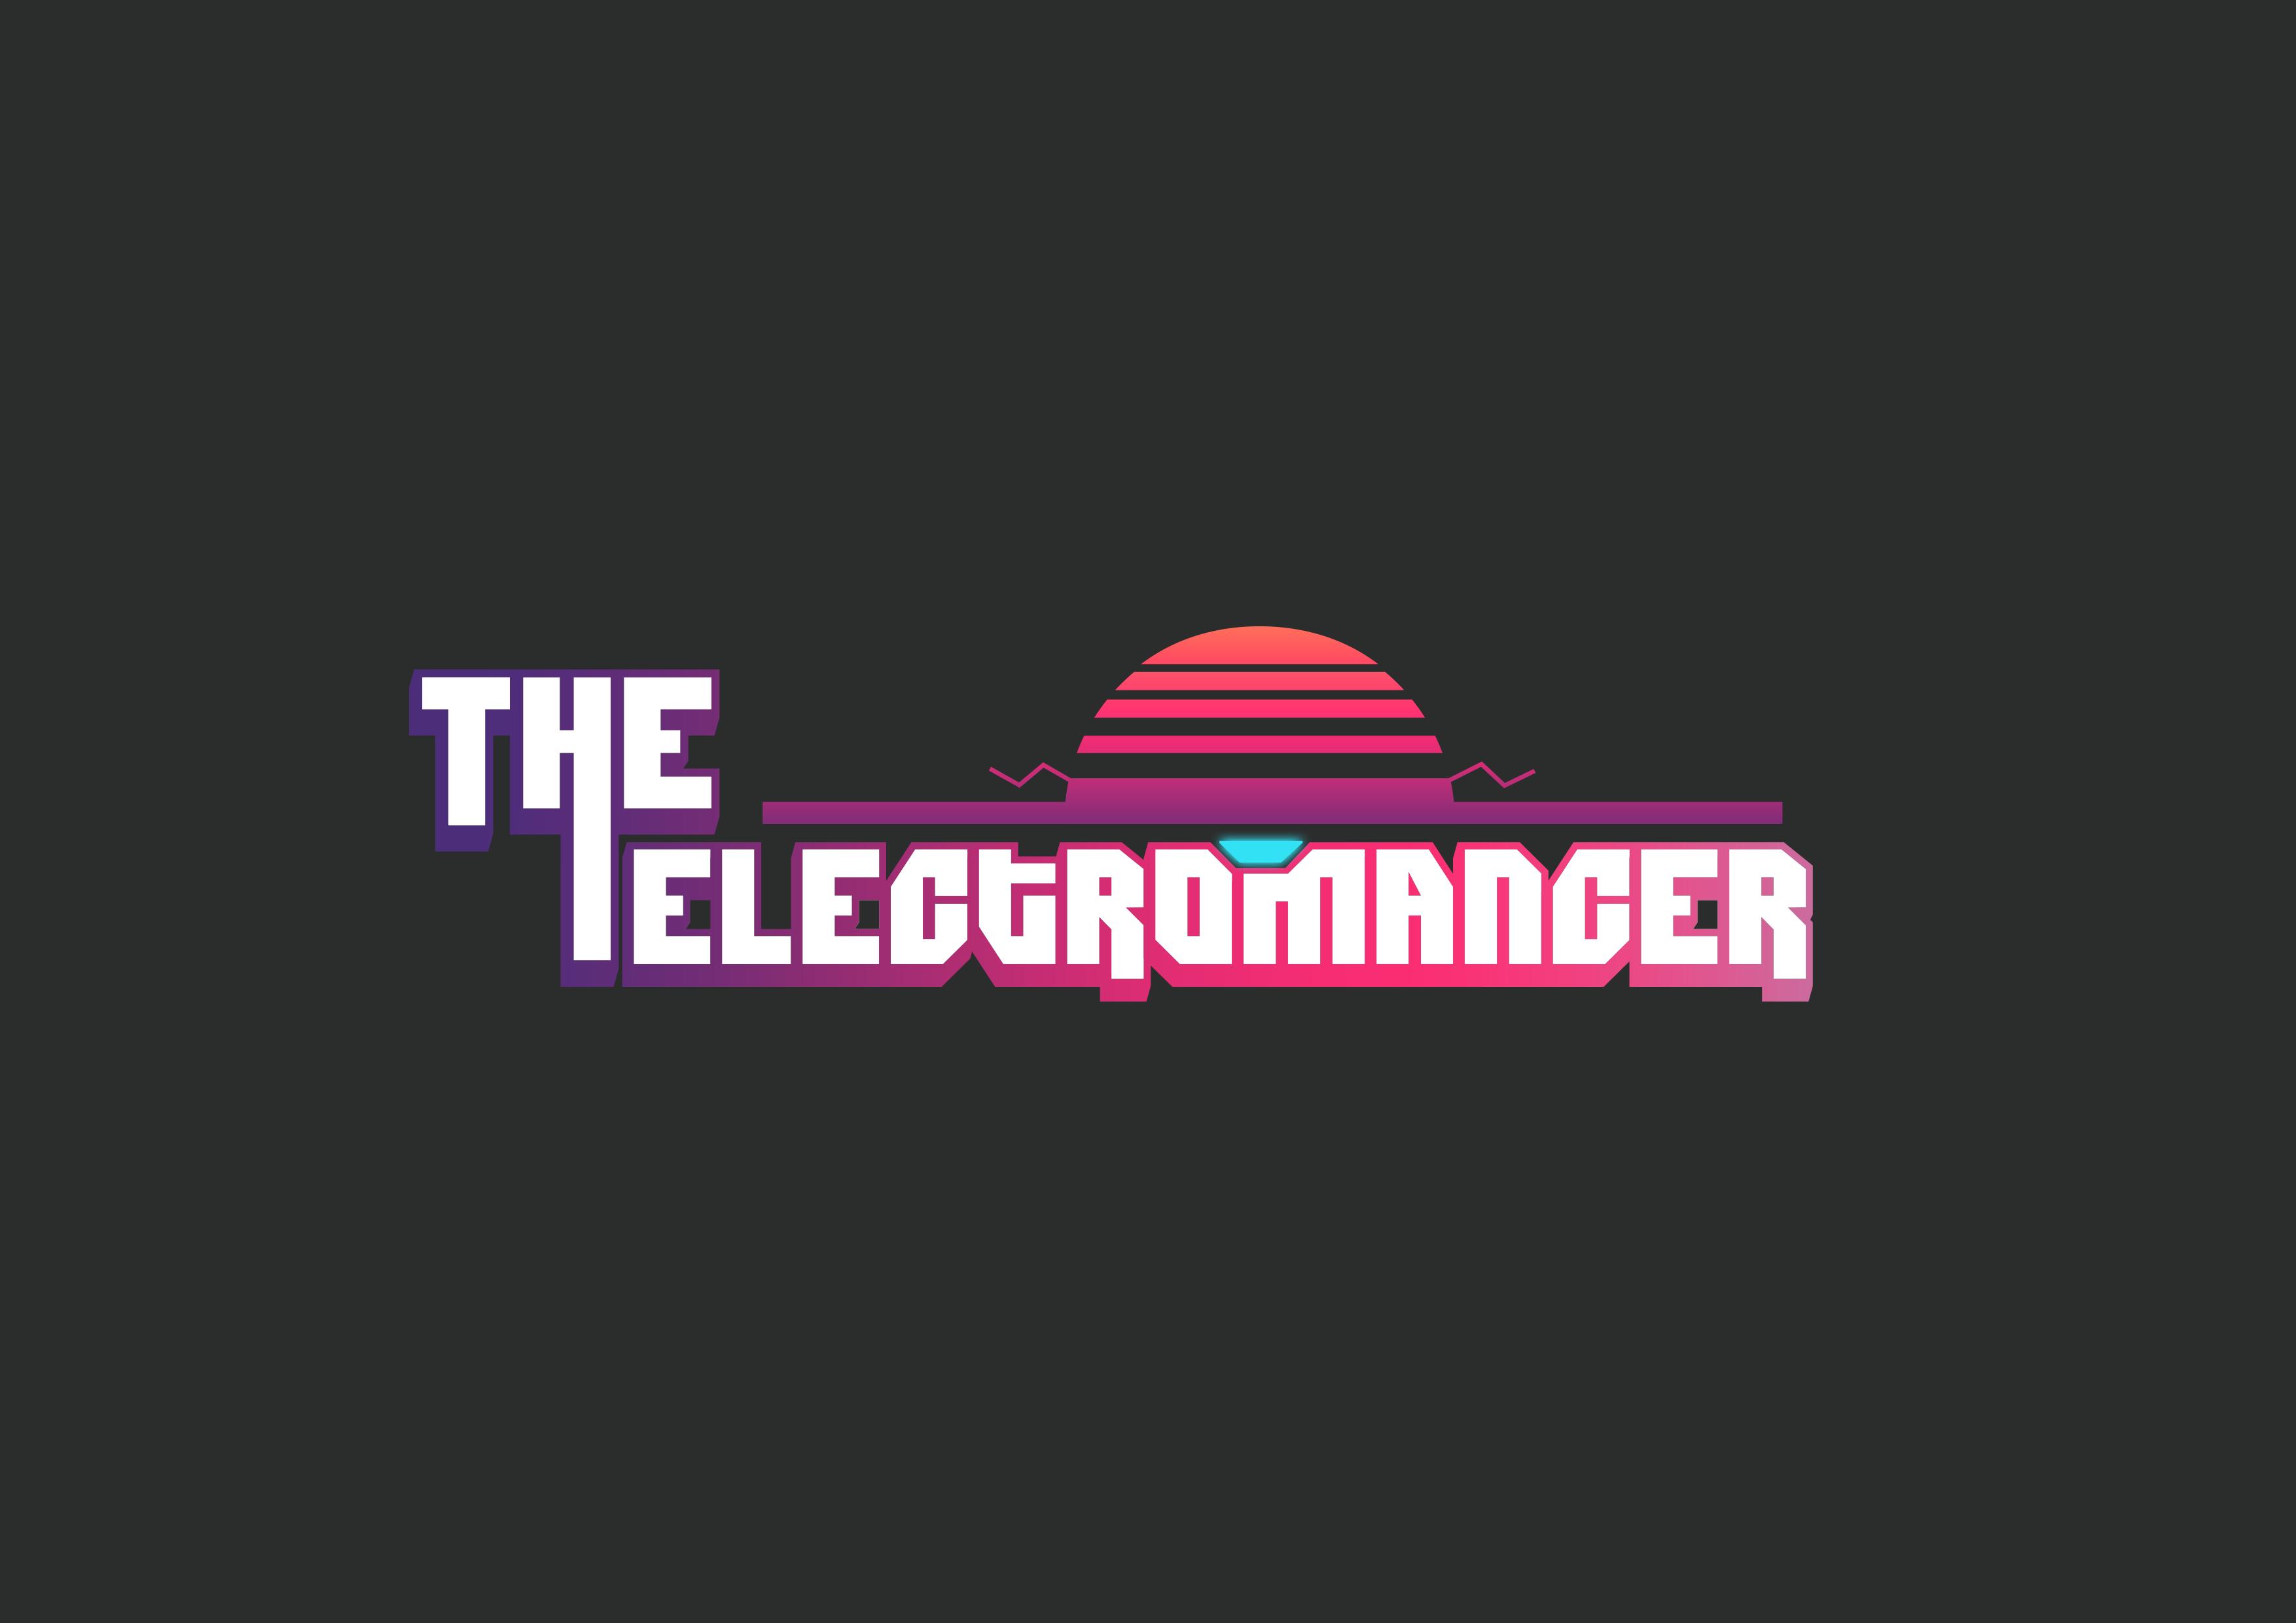 The Electromancer